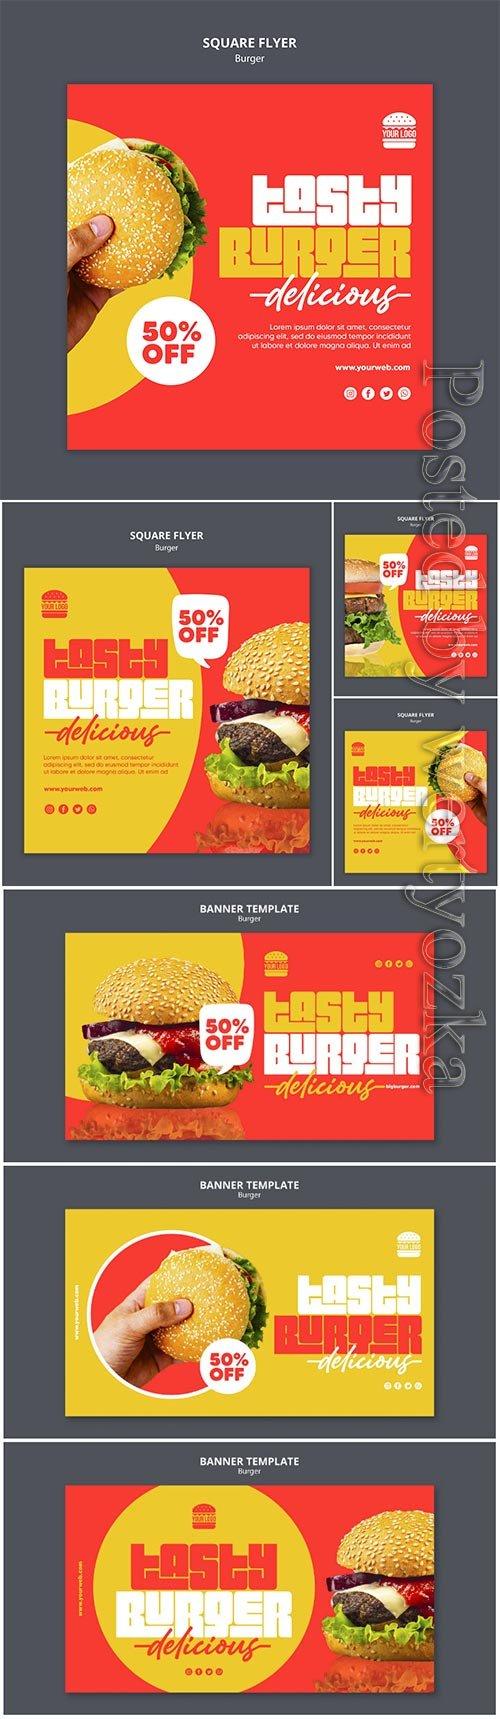 Burger concept banner template psd